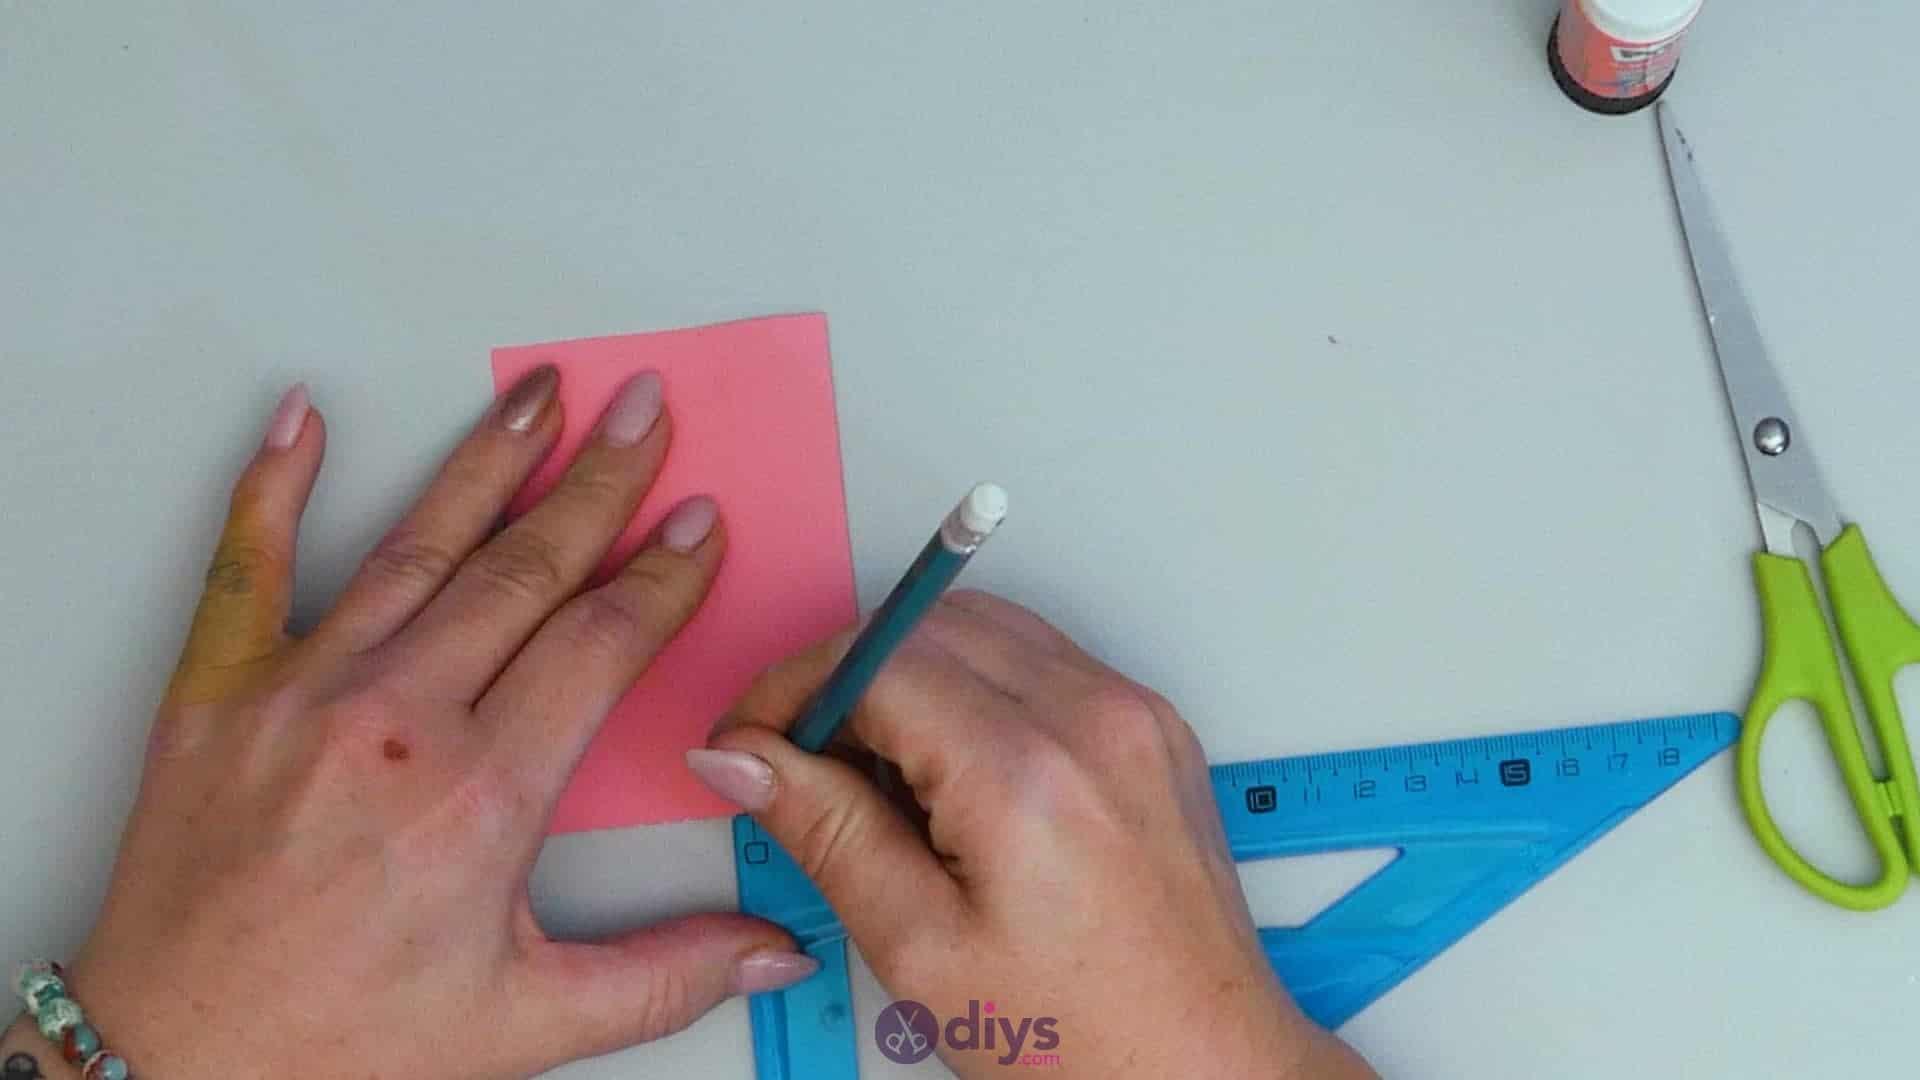 Diy lipstick gift card step 5c